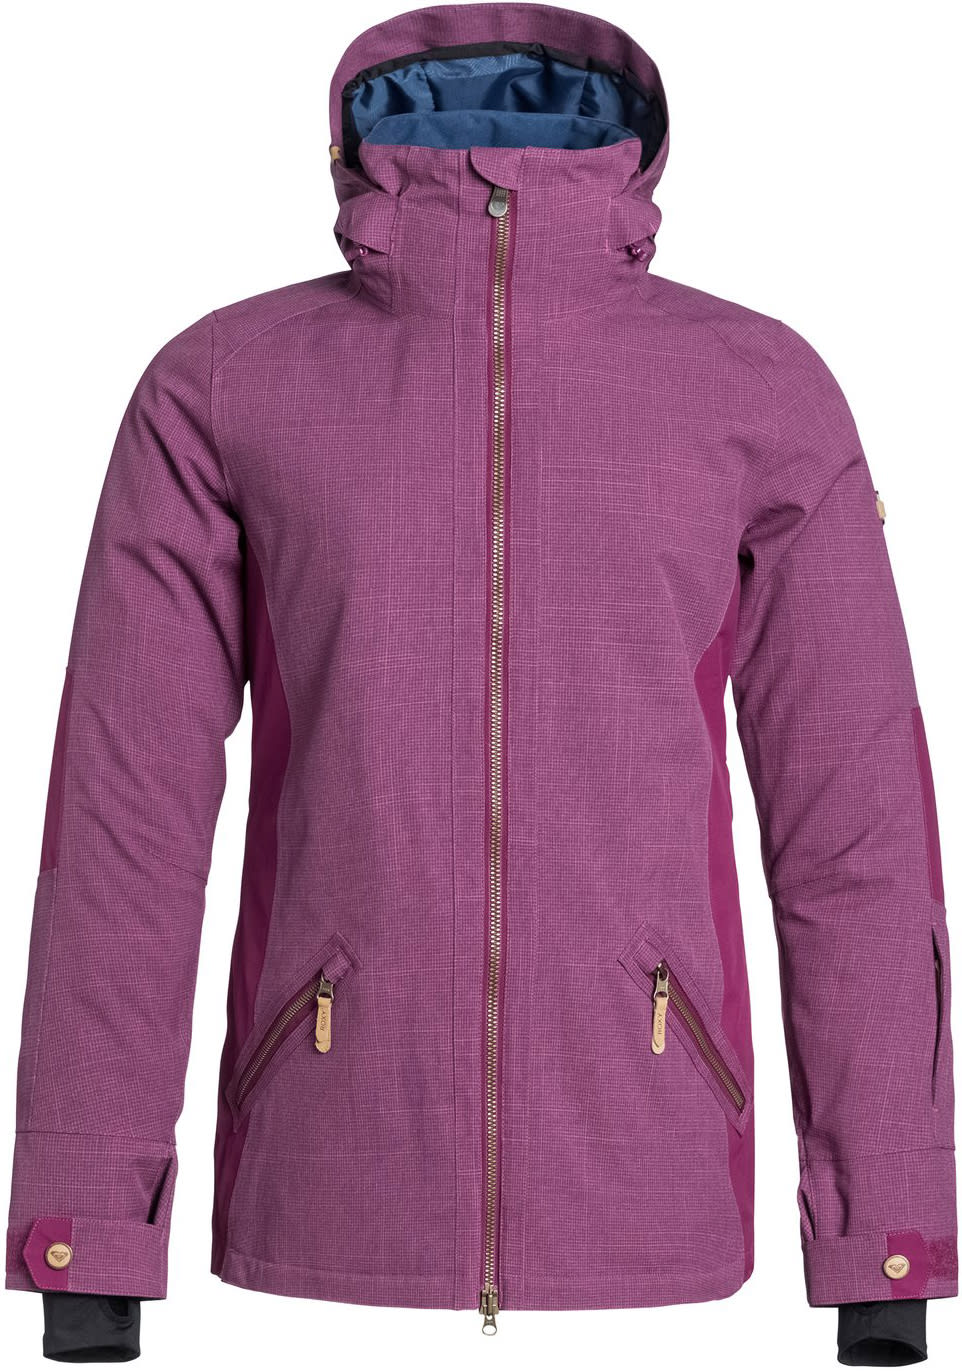 Womens roxy snowboard jackets